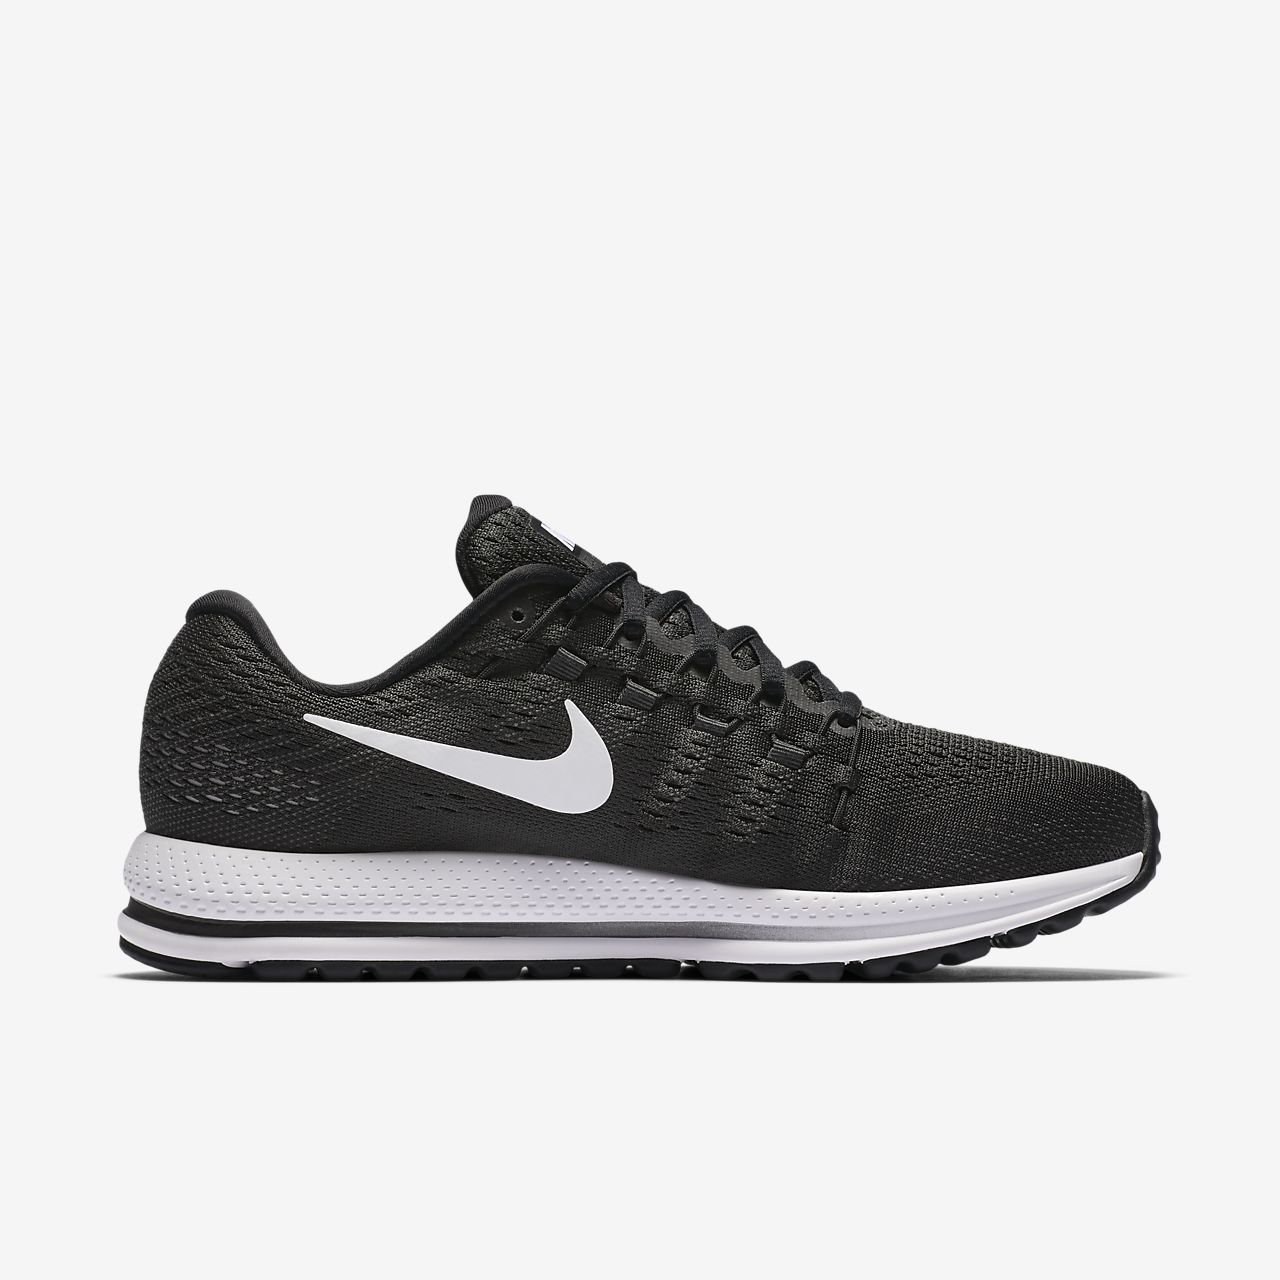 nike shoes vomero 12 foghat live ii 860234